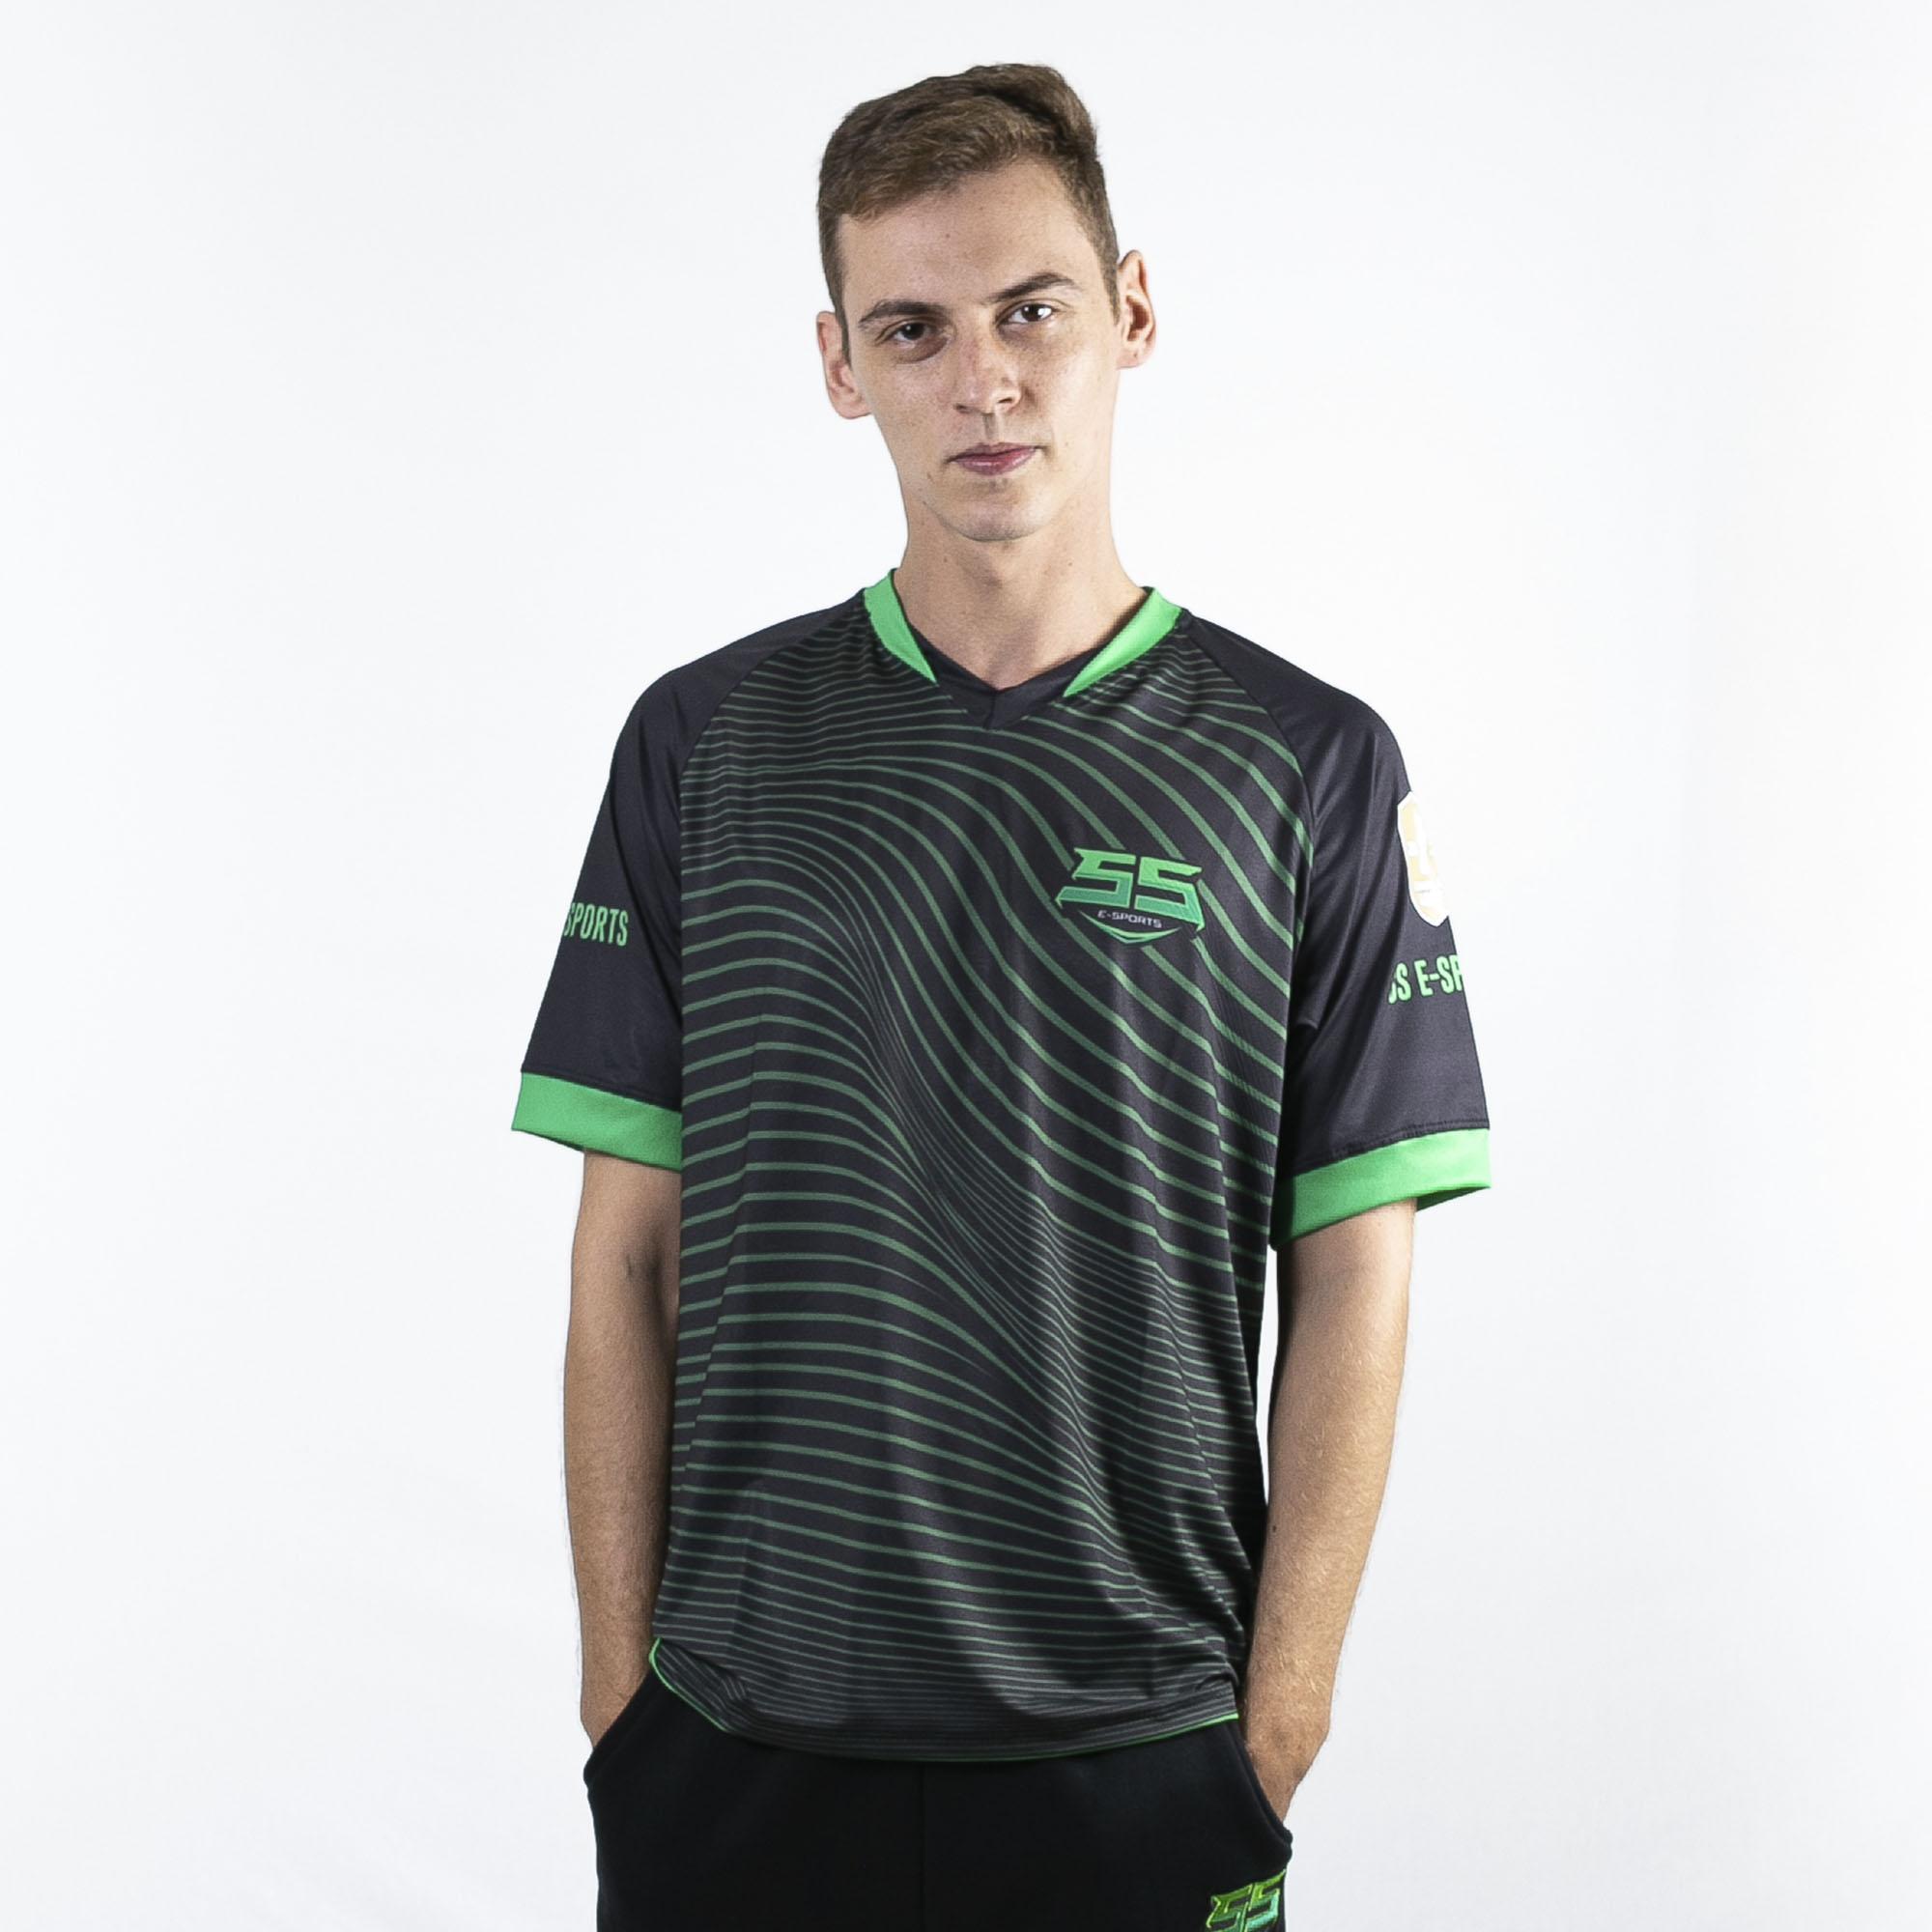 Camiseta Jersey SS Esports Oficial